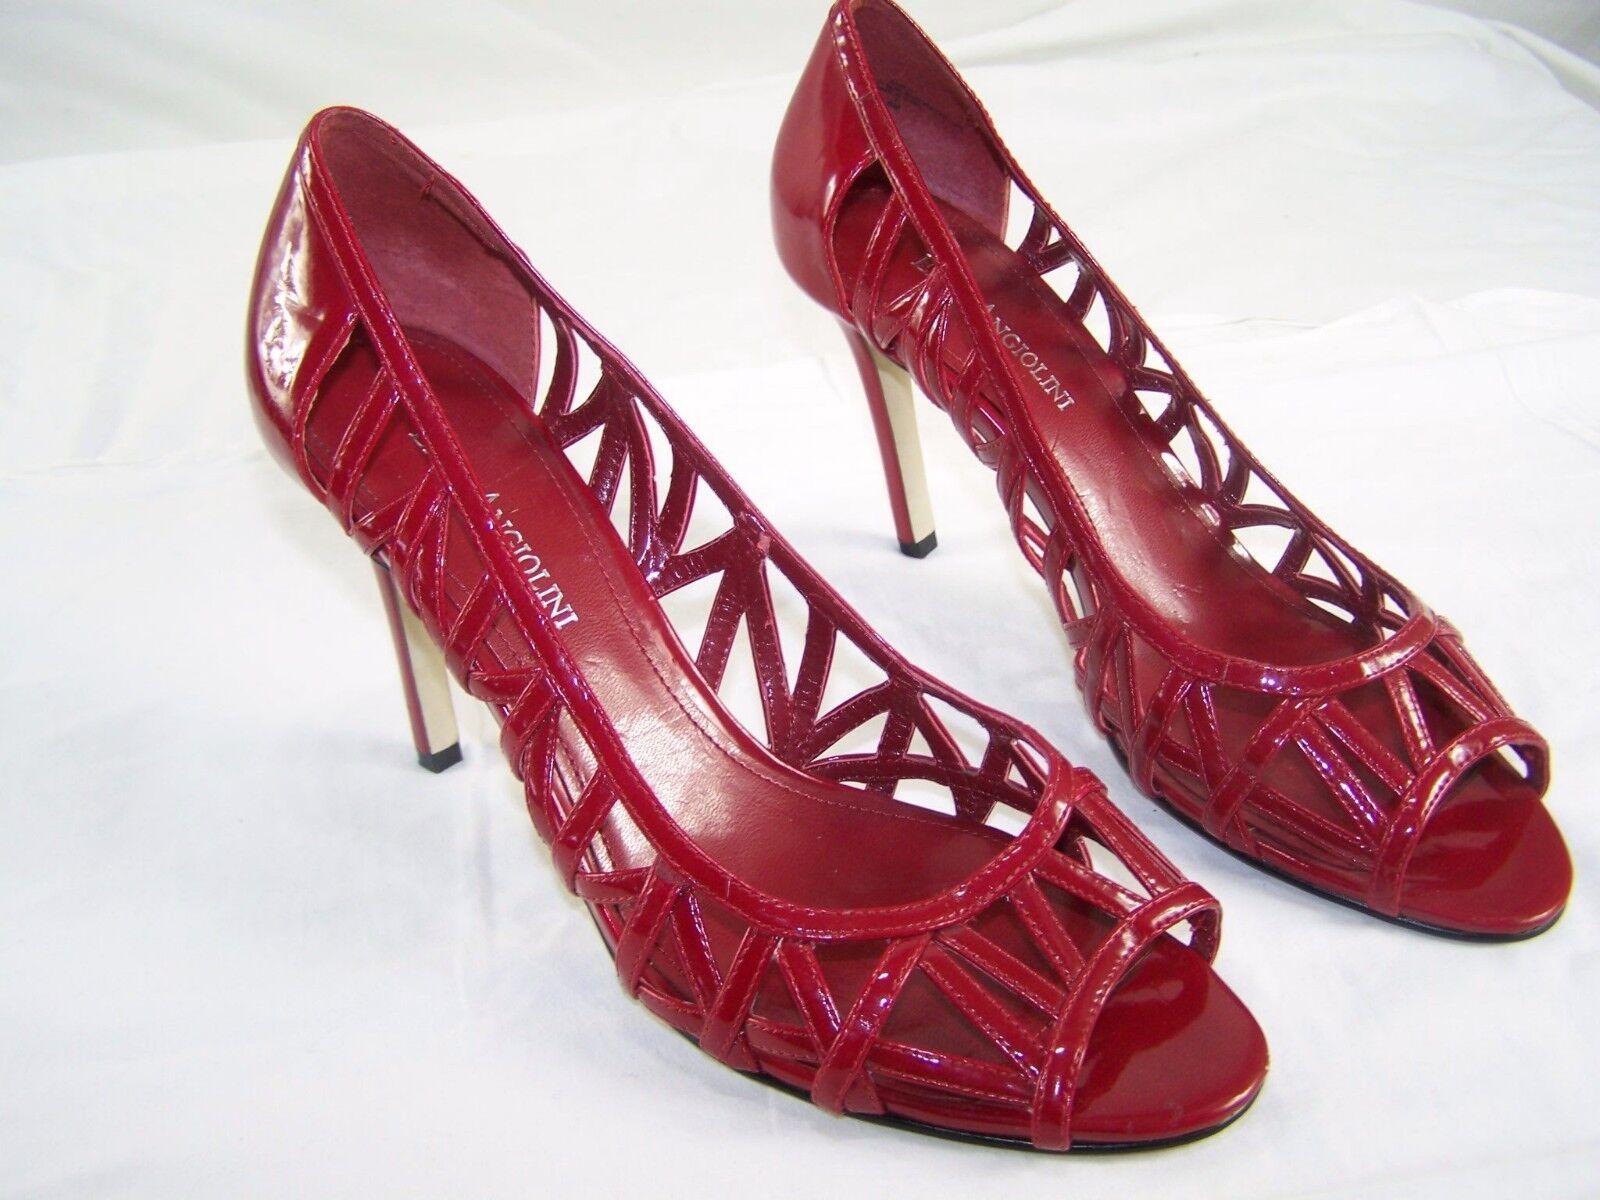 Enzo aniolinig Rouge Oeillet Wet Look Bout Ouvert Talons Hauts Chaussures Femme Taille 8 M 8 m